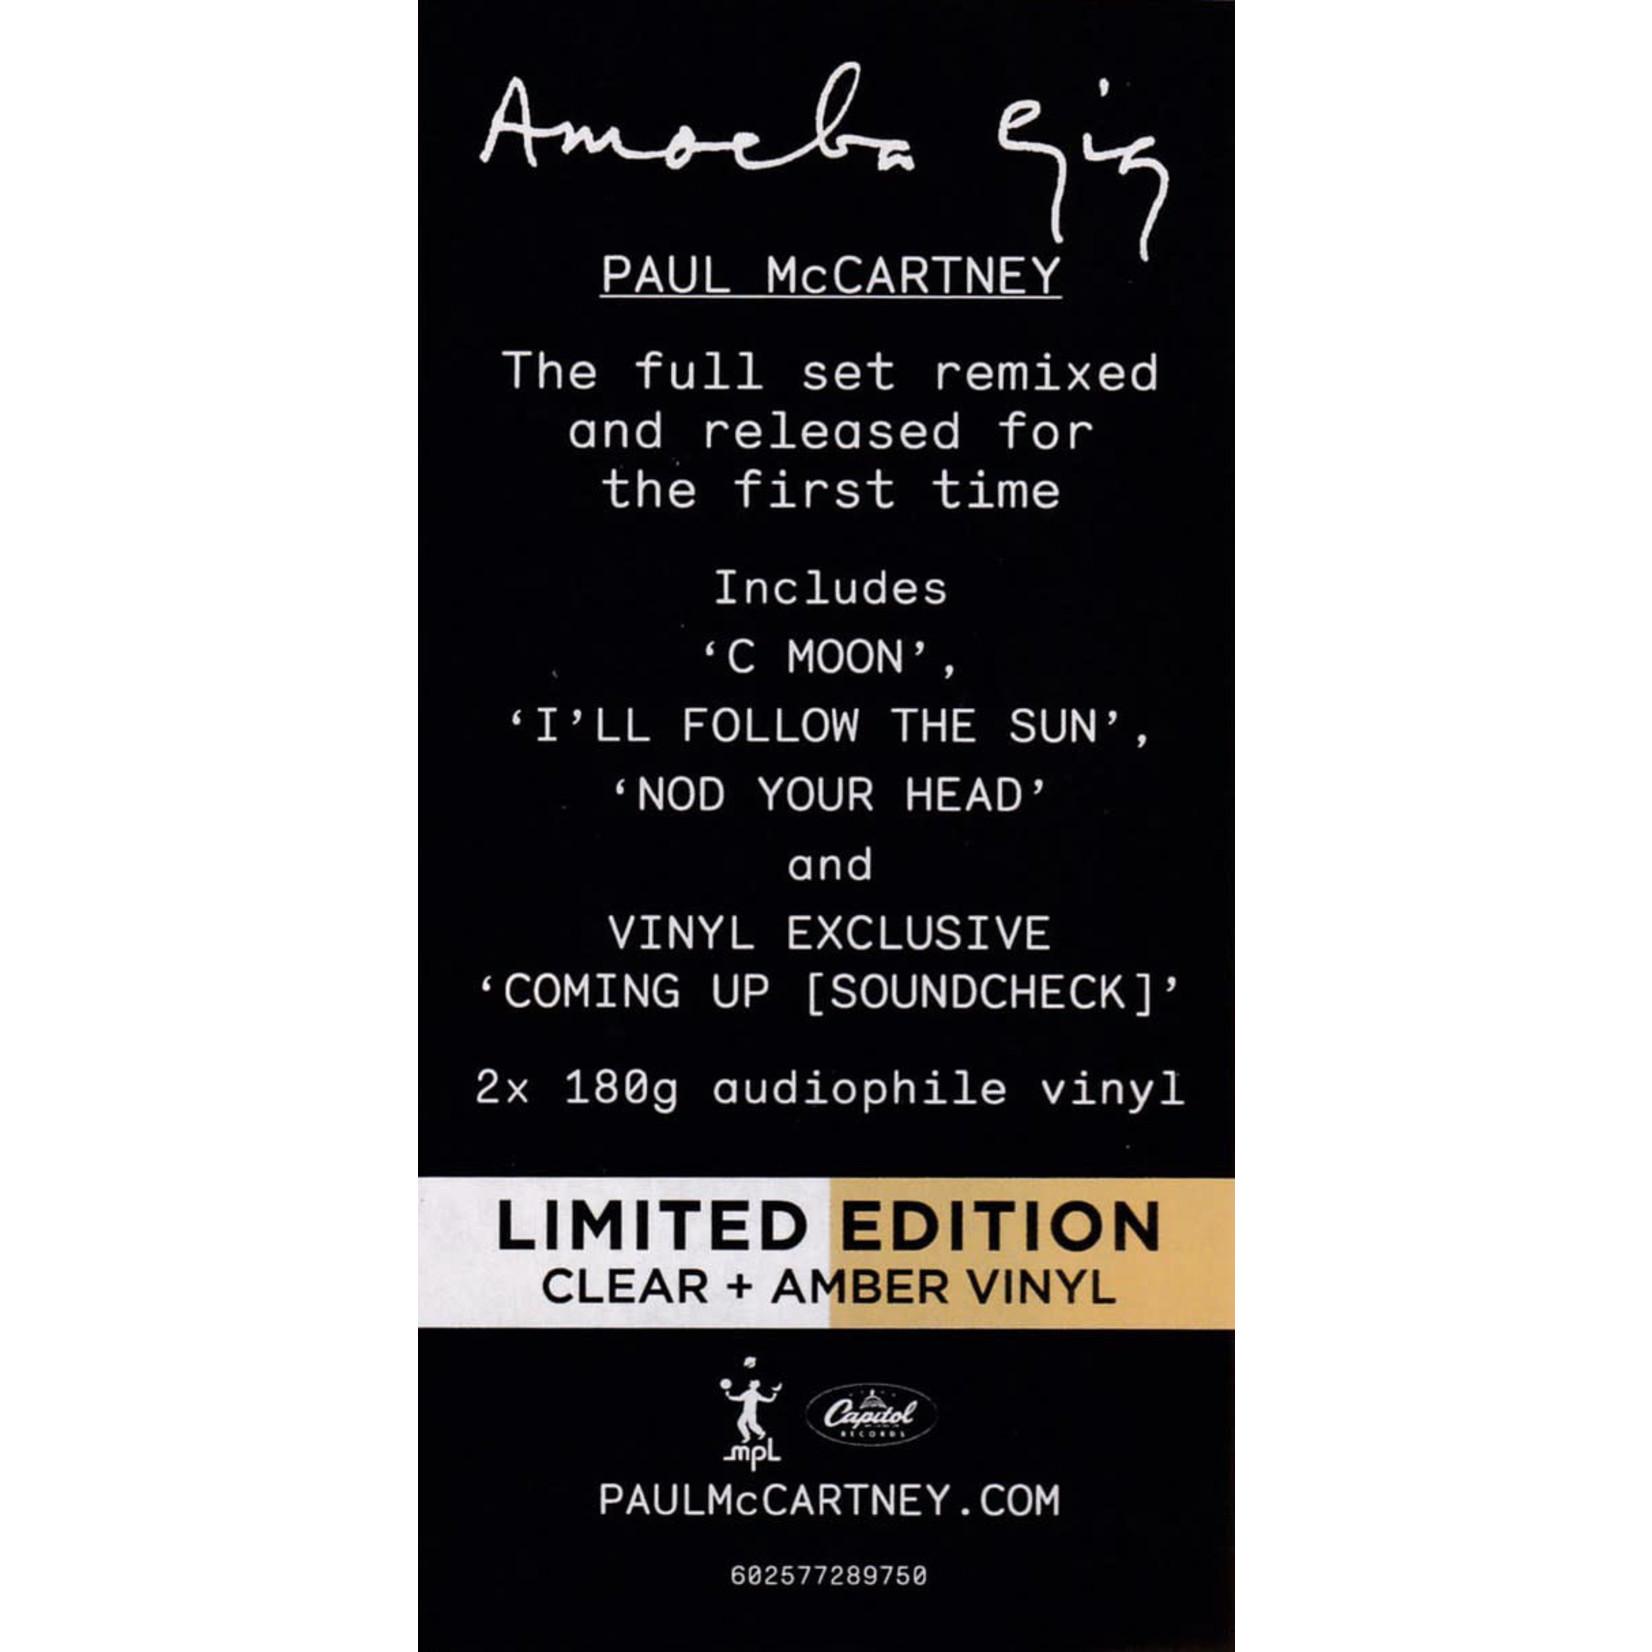 PAUL McCARTNEY AMOEBA GIG  2LP COLOR LTD EDITION